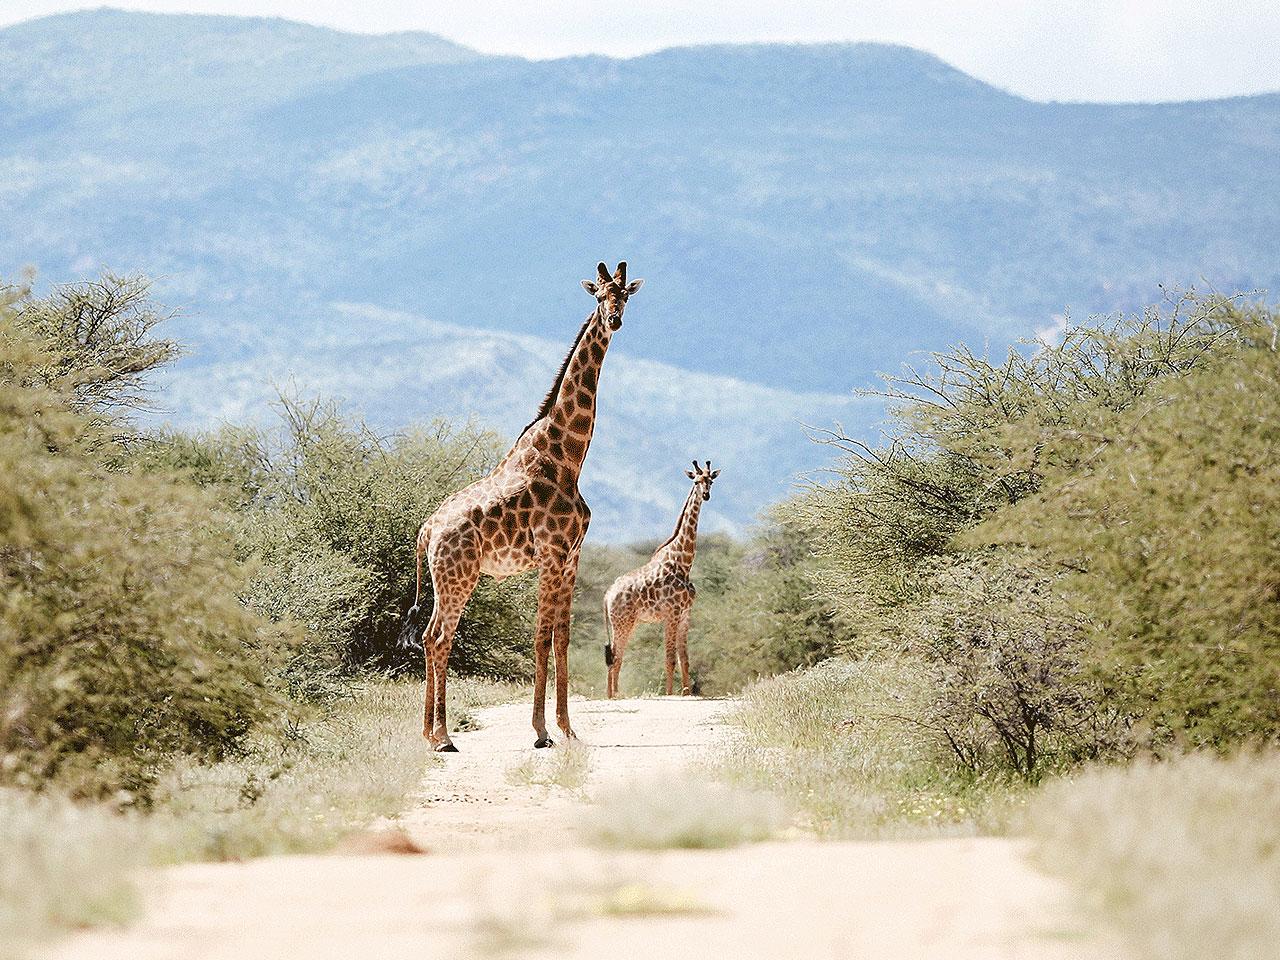 Central Namibia inline image 5e425e61af4e9